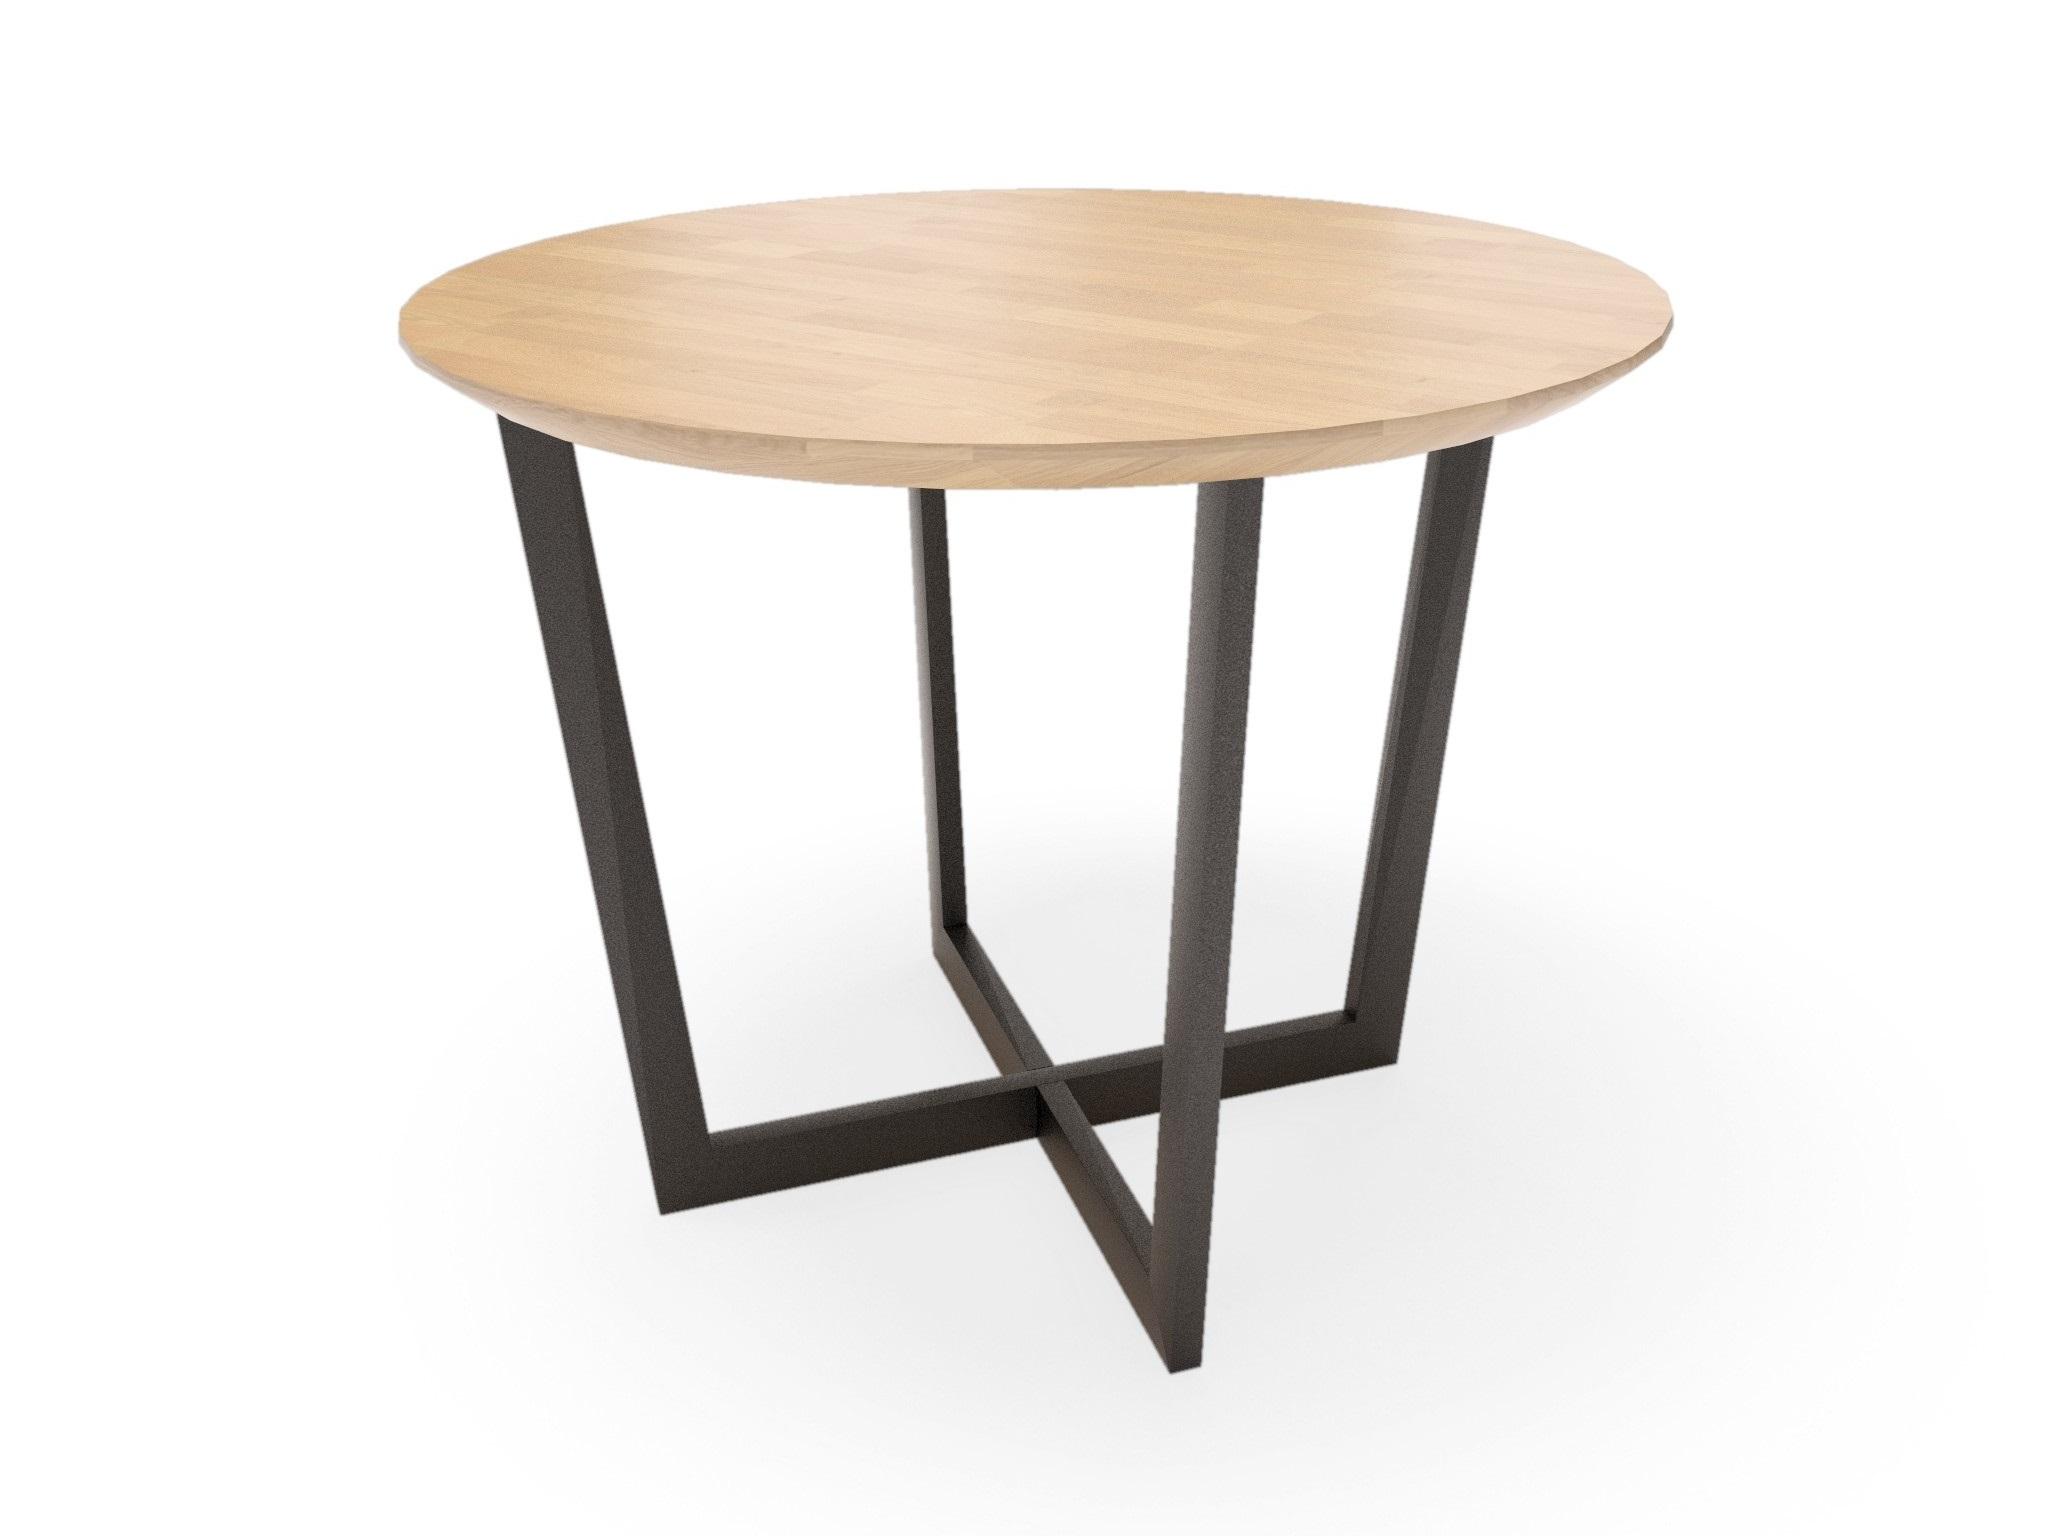 Кухонный стол Millwood 15436873 от thefurnish